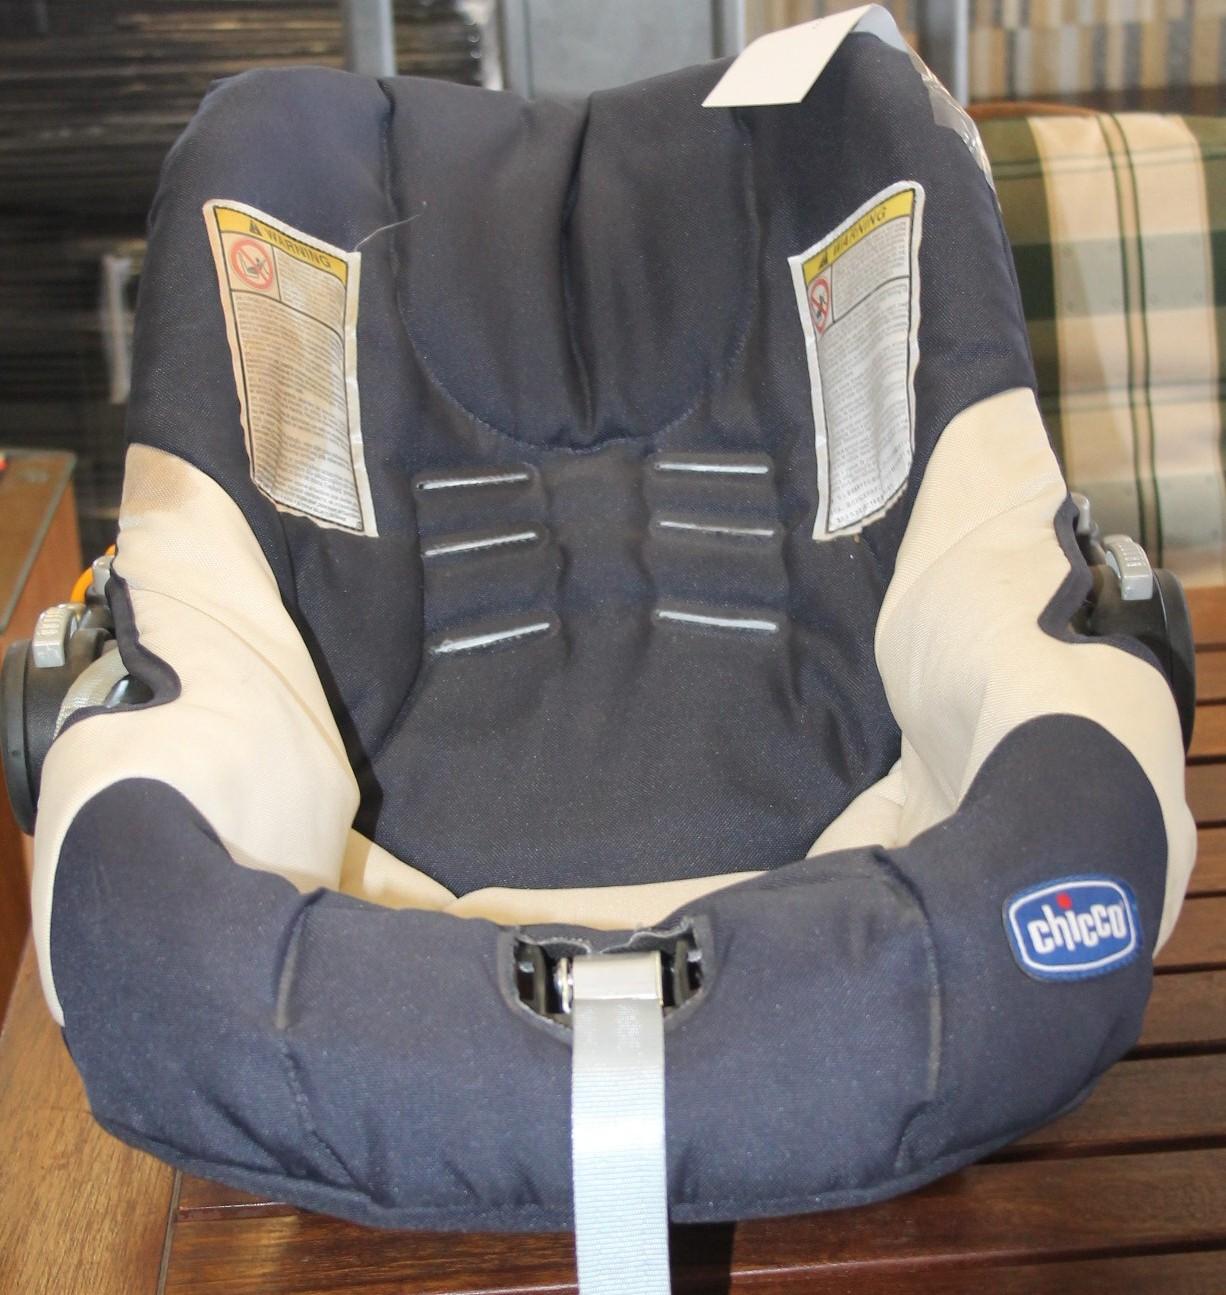 Chicco car seat S028445b #Rosettenvillepawnshop